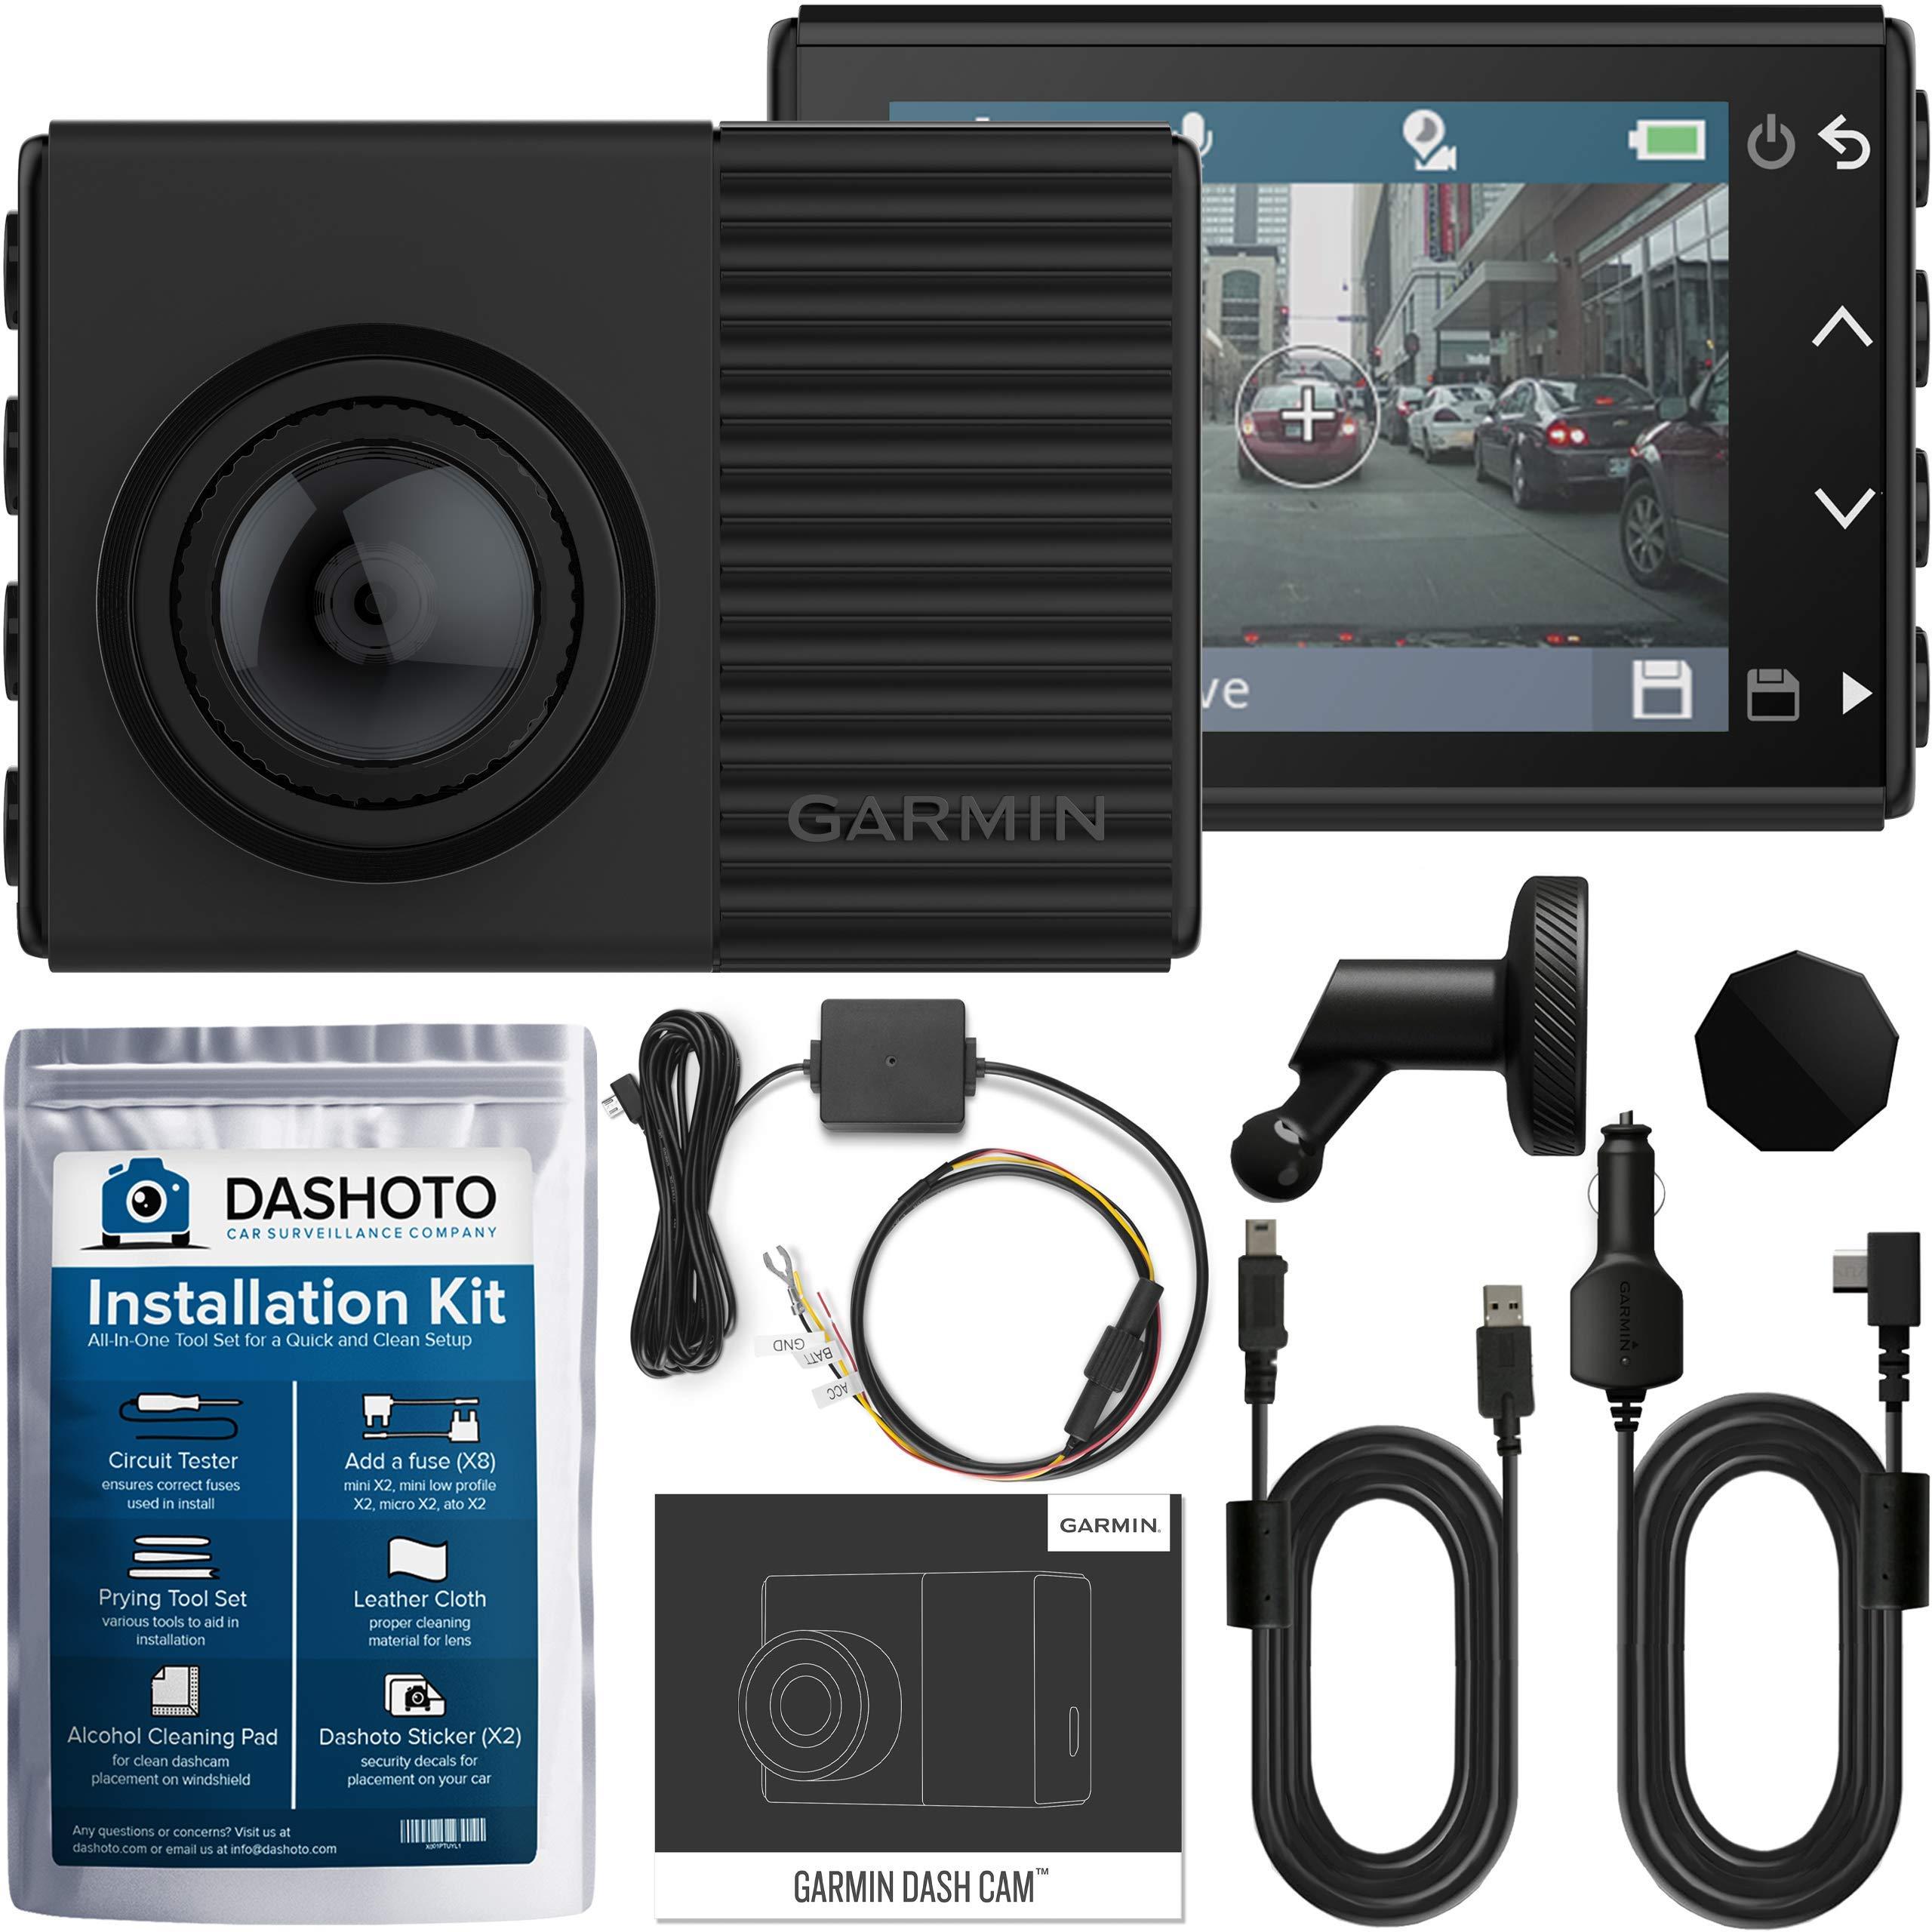 Mua Garmin Dash Cam 66W Parking Mode Bundle | 1440P Ultra-Wide HDR Recording, 180 Degree Viewing Angle, WiFi, GPS and Voice Control | Installation Kit Included (New 2020) trên Amazon Mỹ chính hãng 2021 | Fado